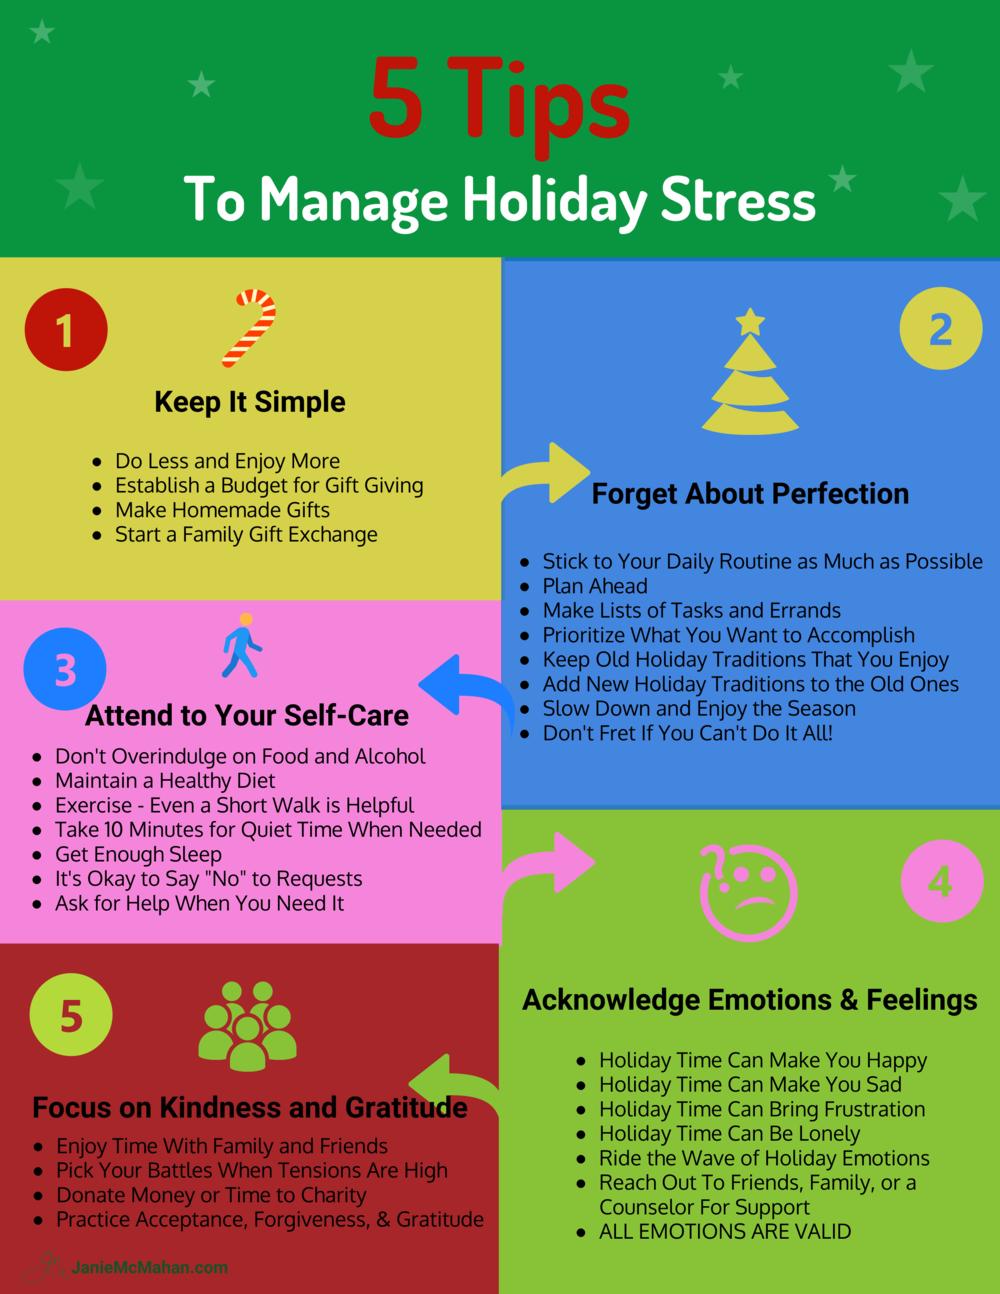 5 Tips to Manage Holiday Stress_November 28 2017.png